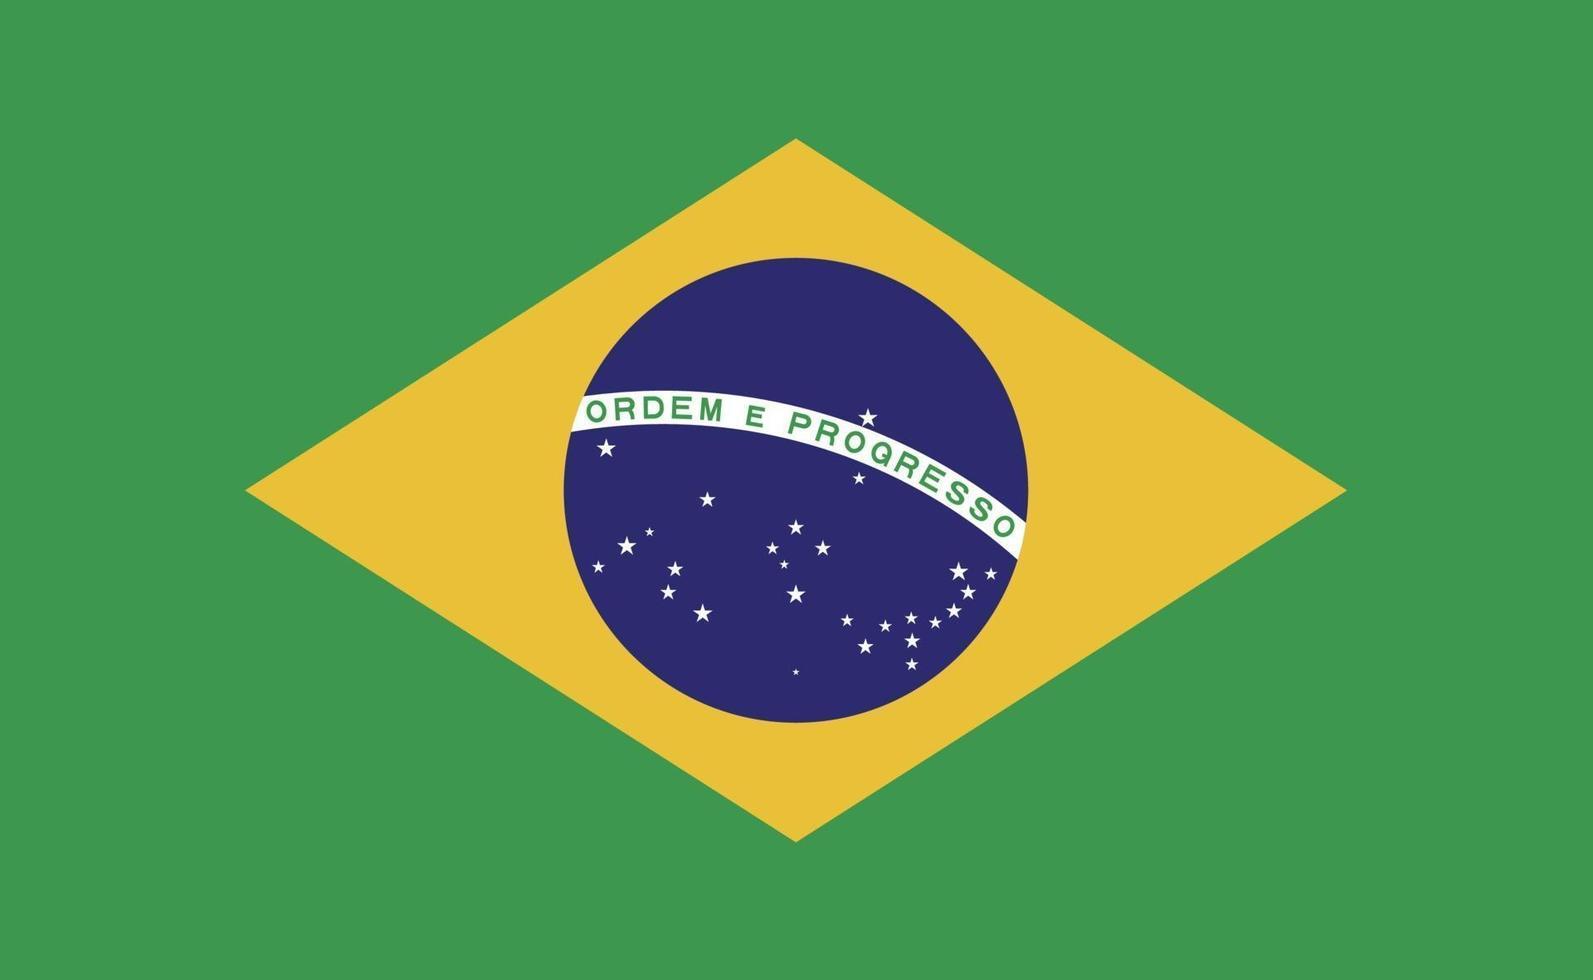 brasiliens nationella flagga i exakta proportioner - vektorillustration vektor